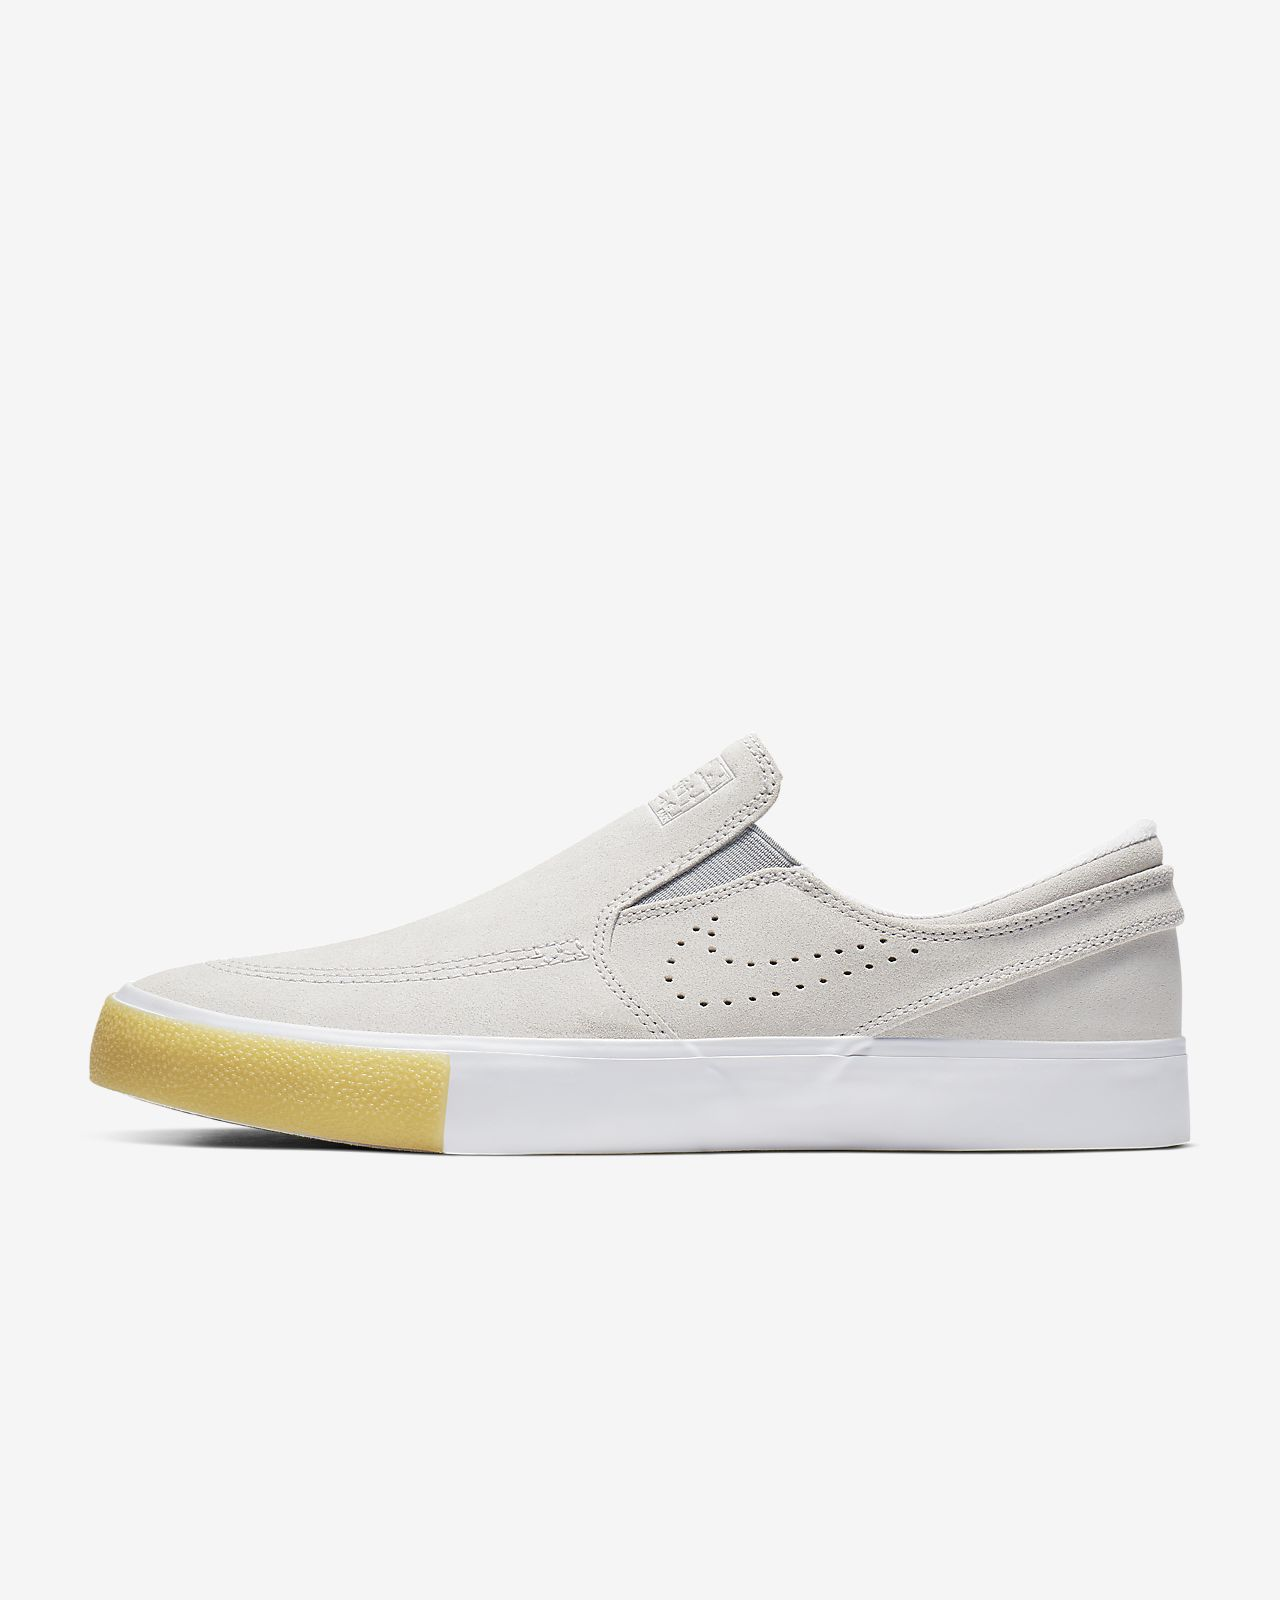 Nike SB Zoom Stefan Janoski Slip RM SE Skateboardschuh